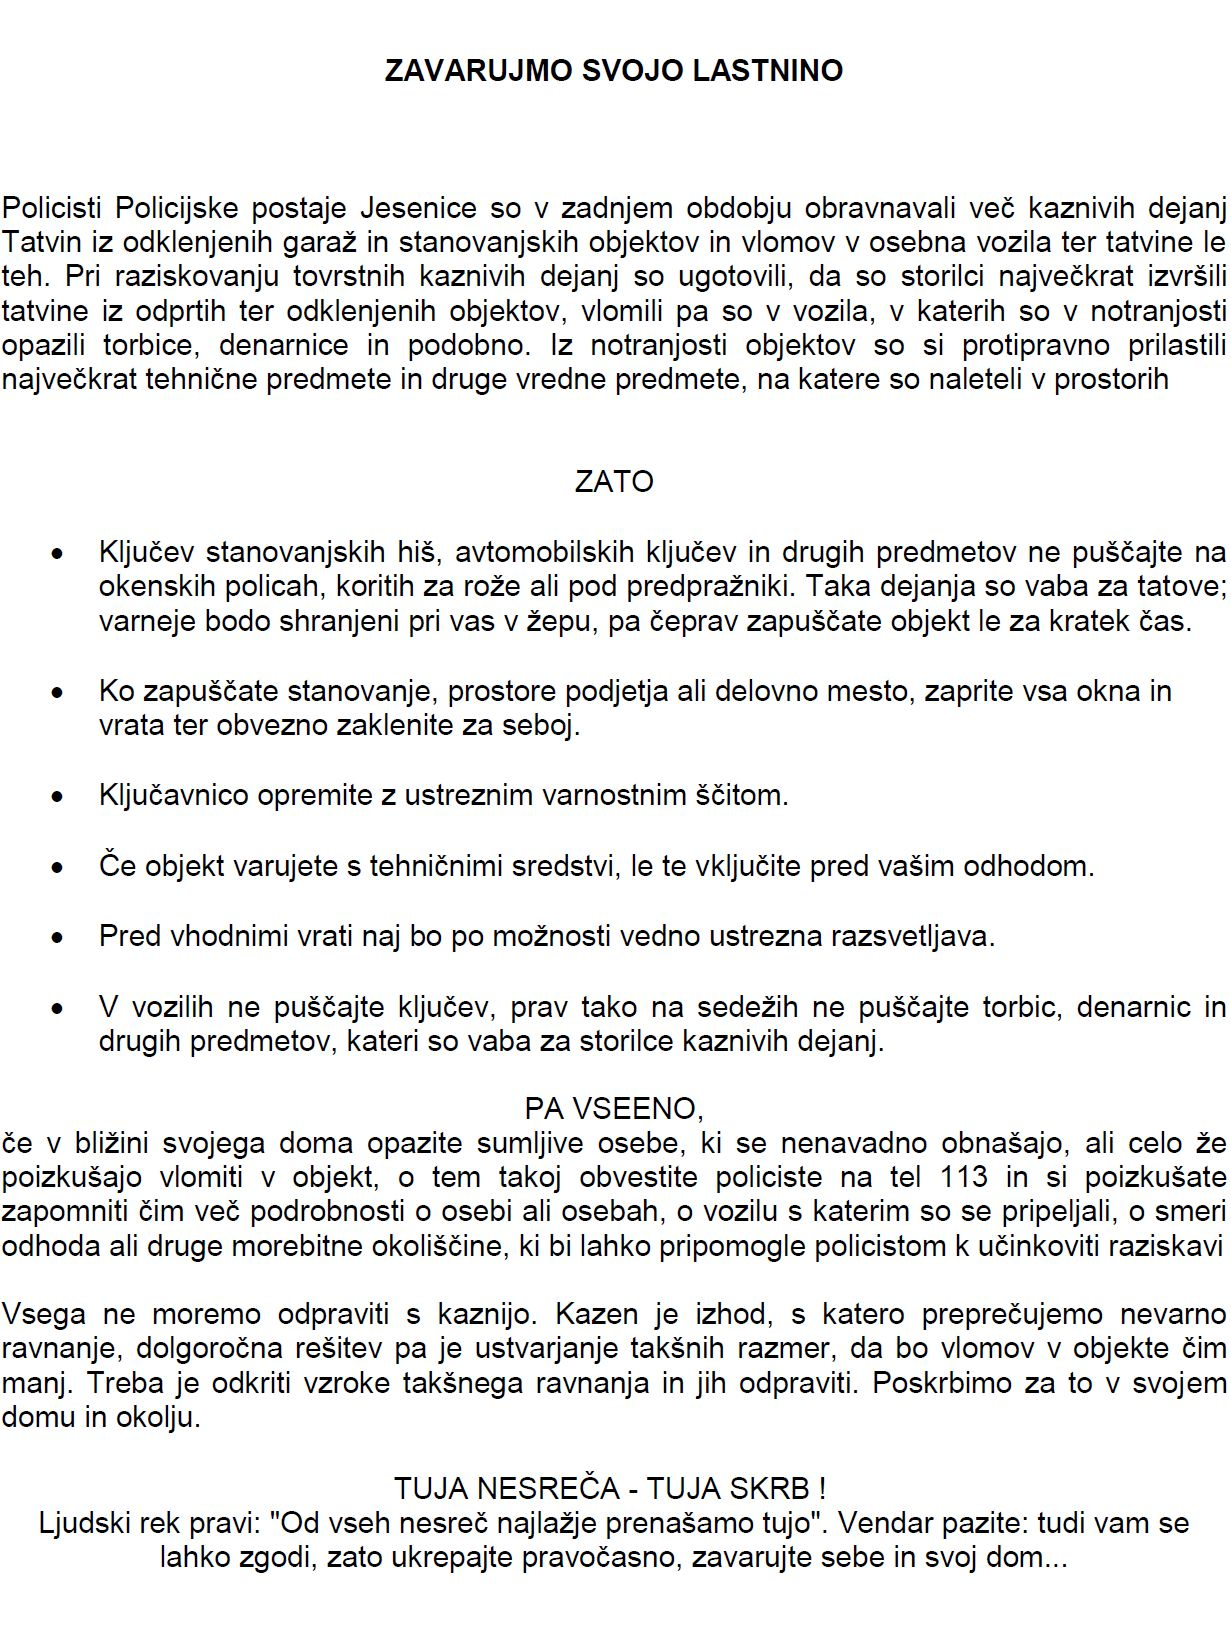 obvestilo pp jesenice